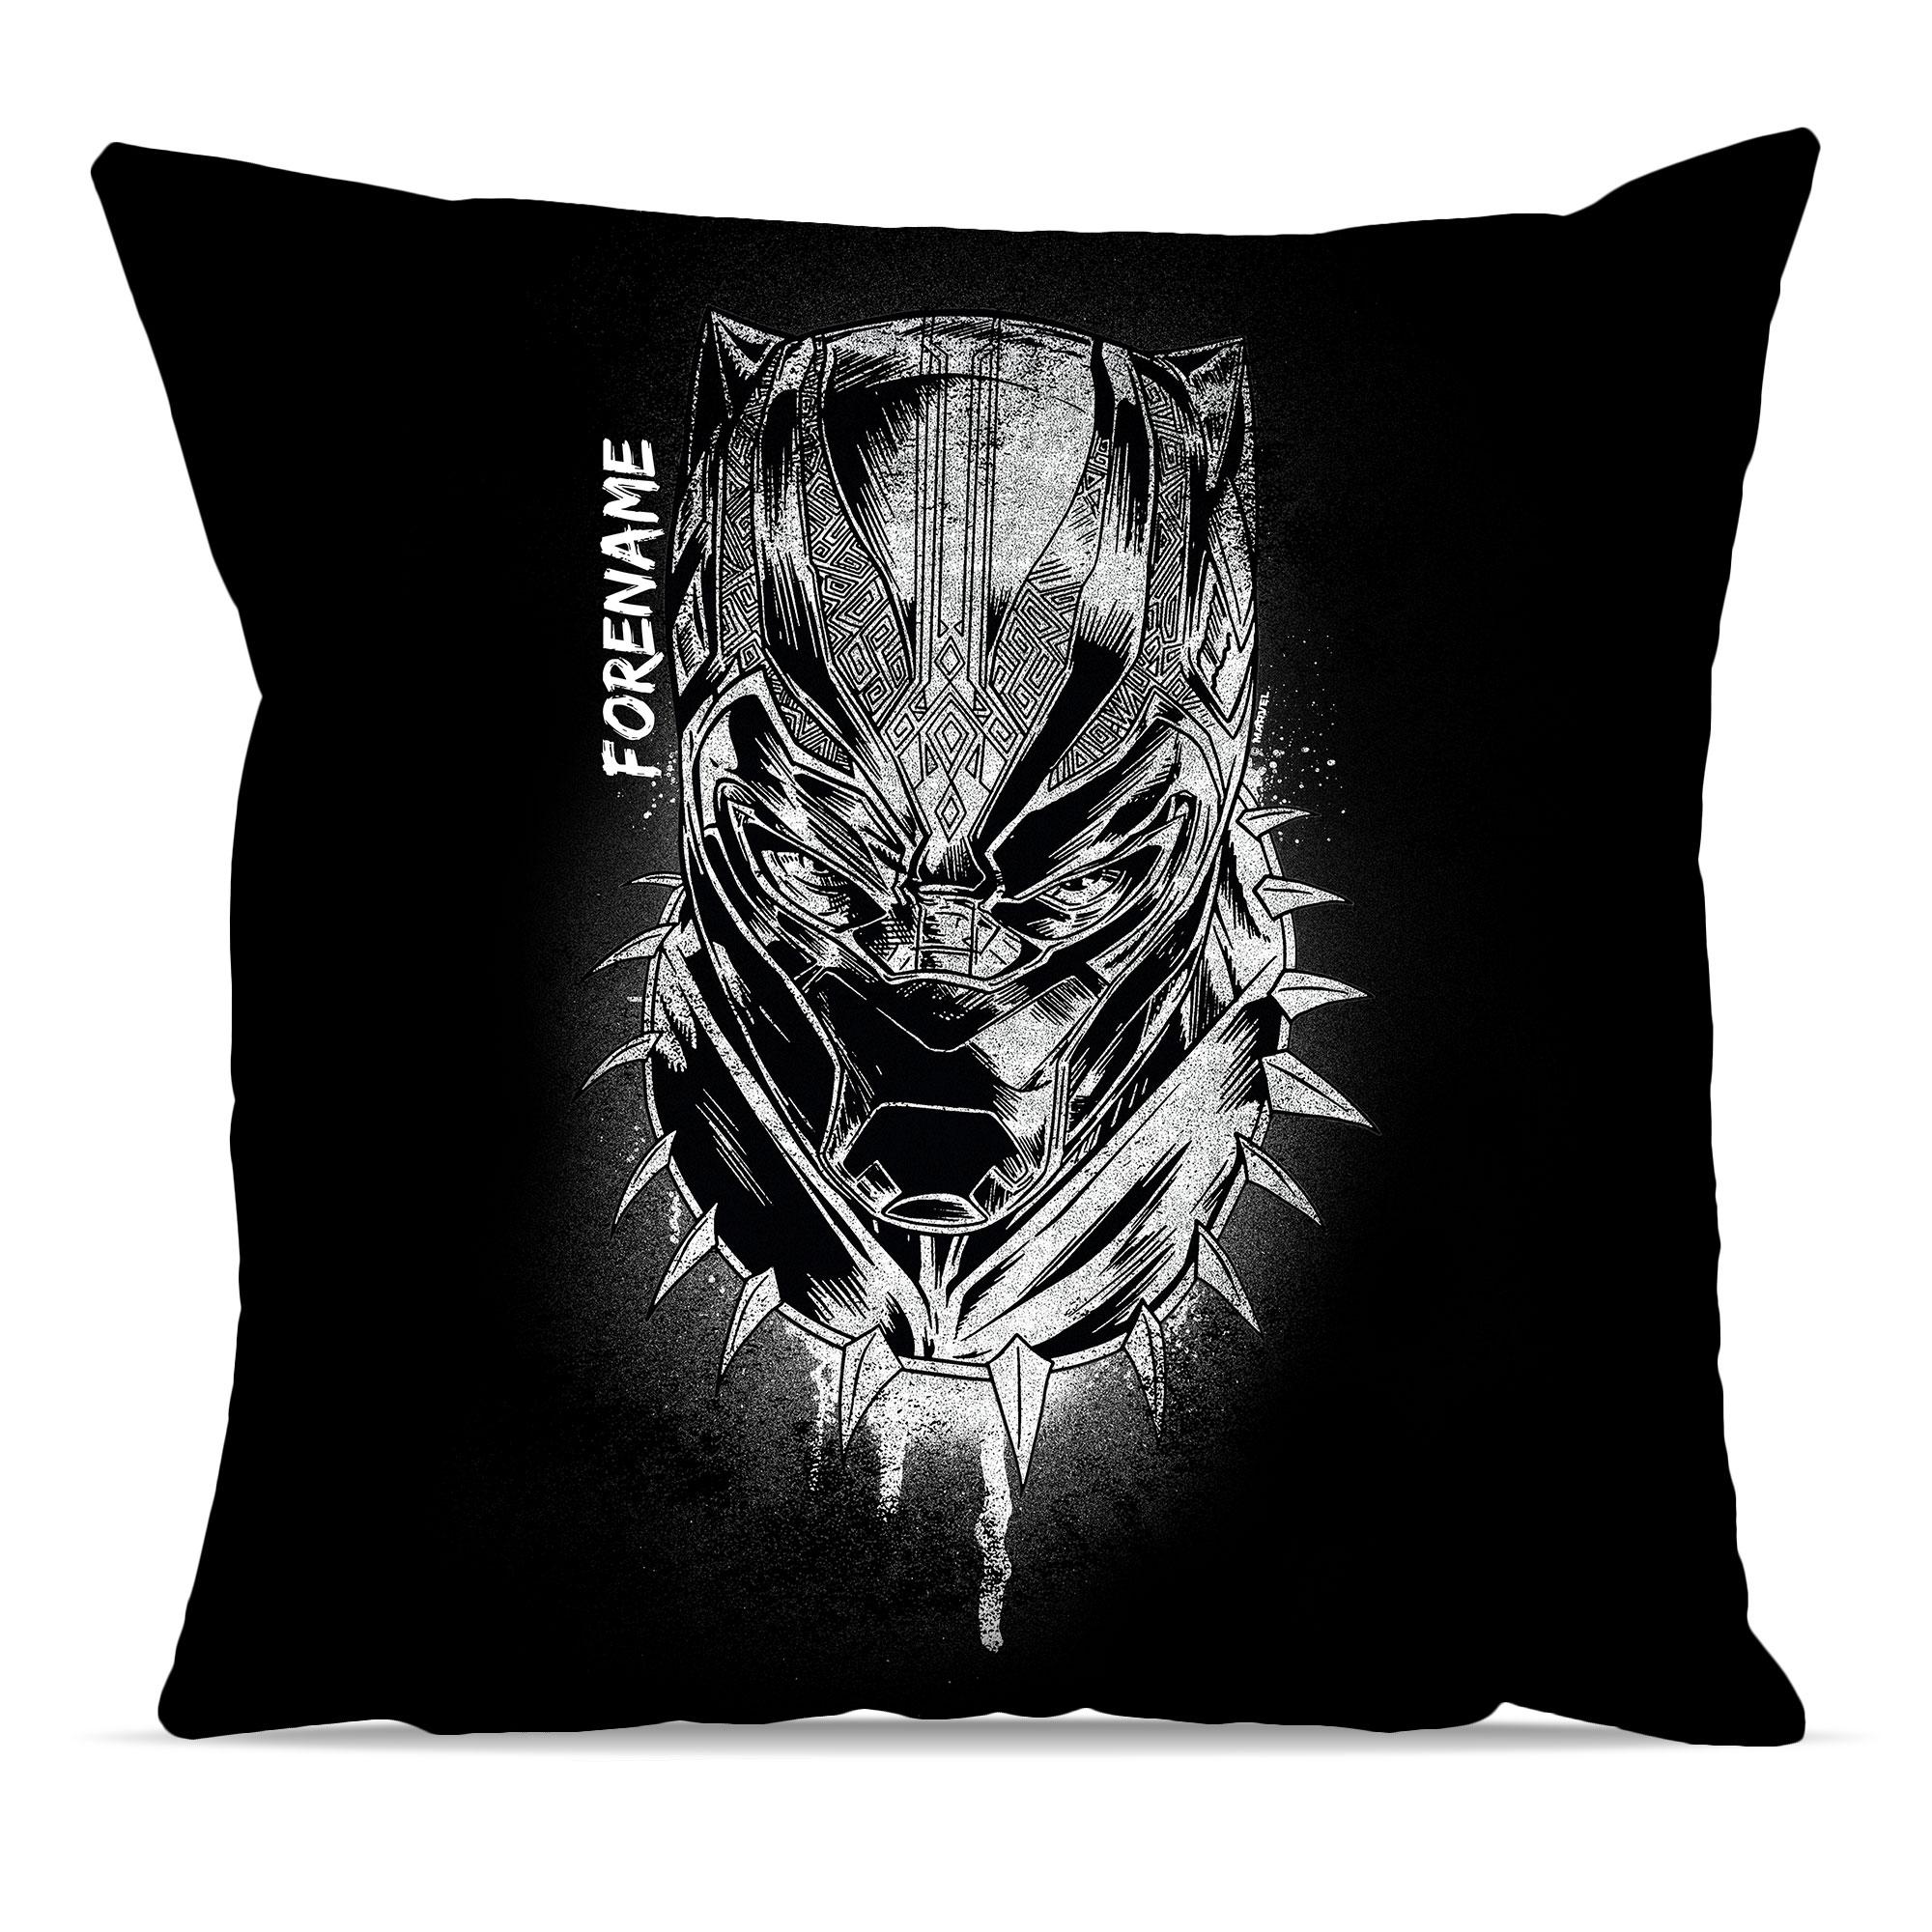 Marvel Black Panther Sketch Cushion